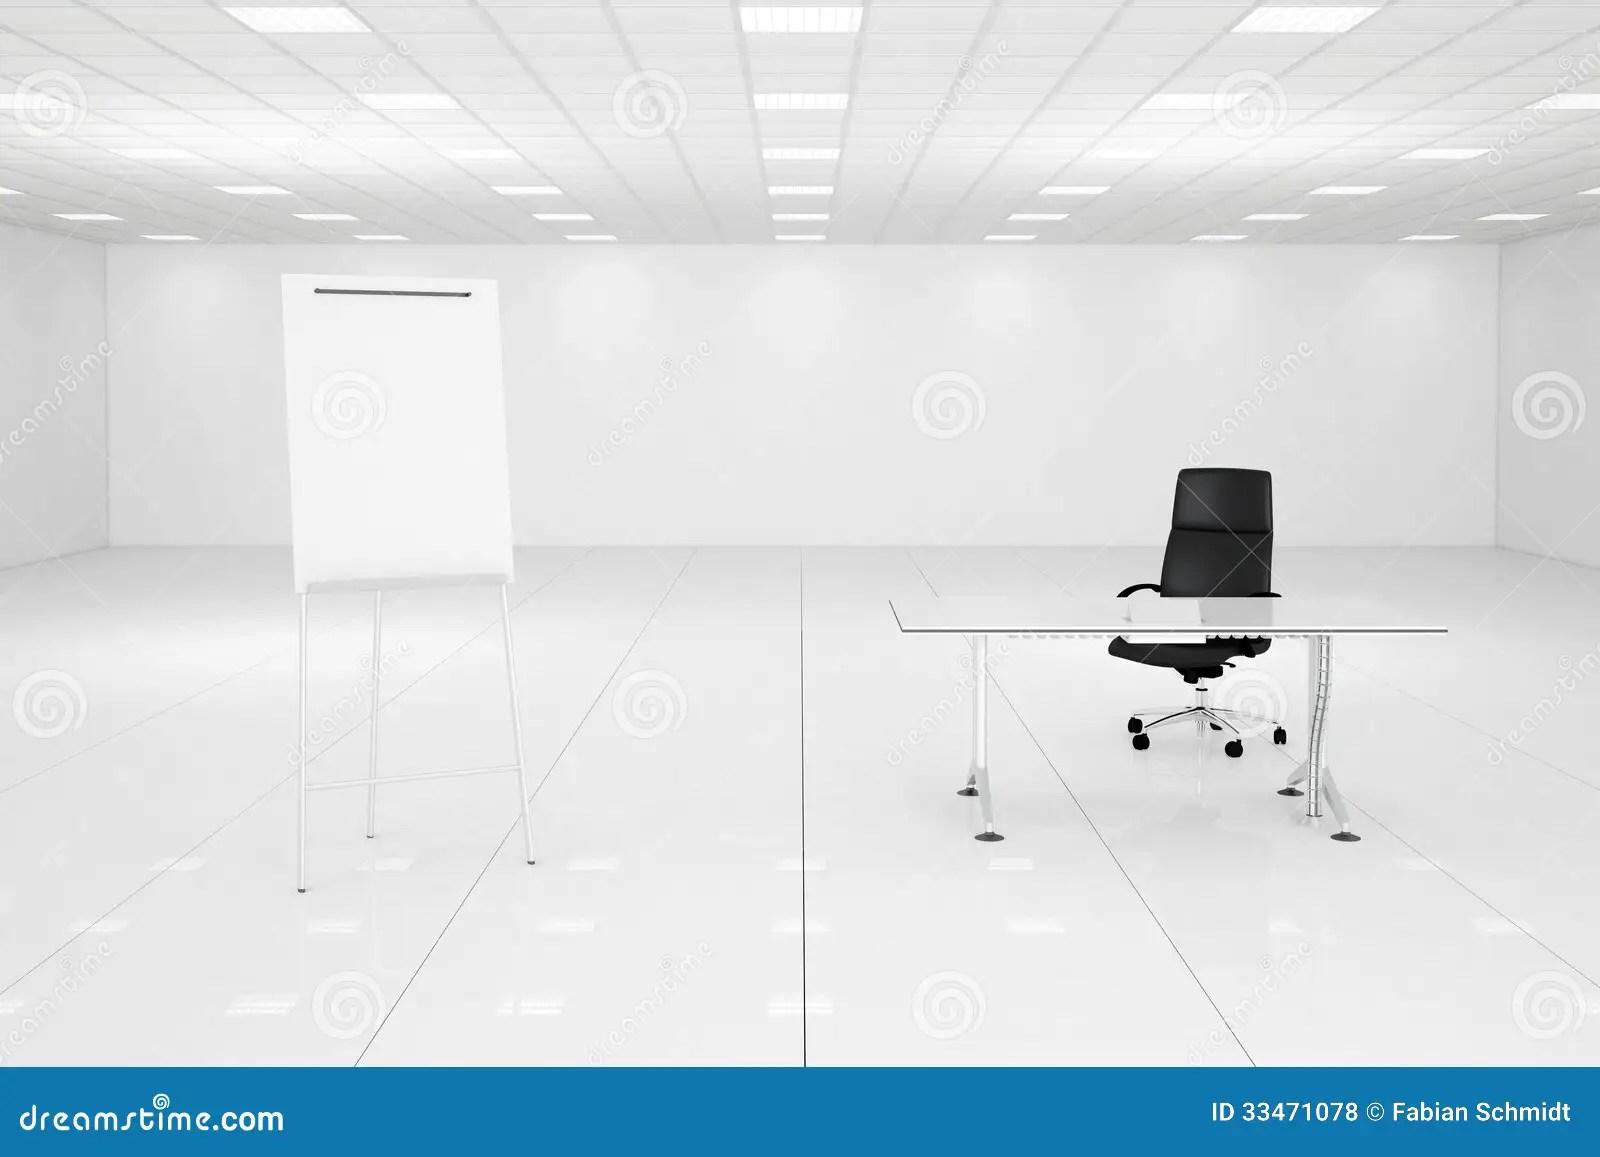 office chair illustration swivel natuzzi white room with flipchart stock - image: 33471078